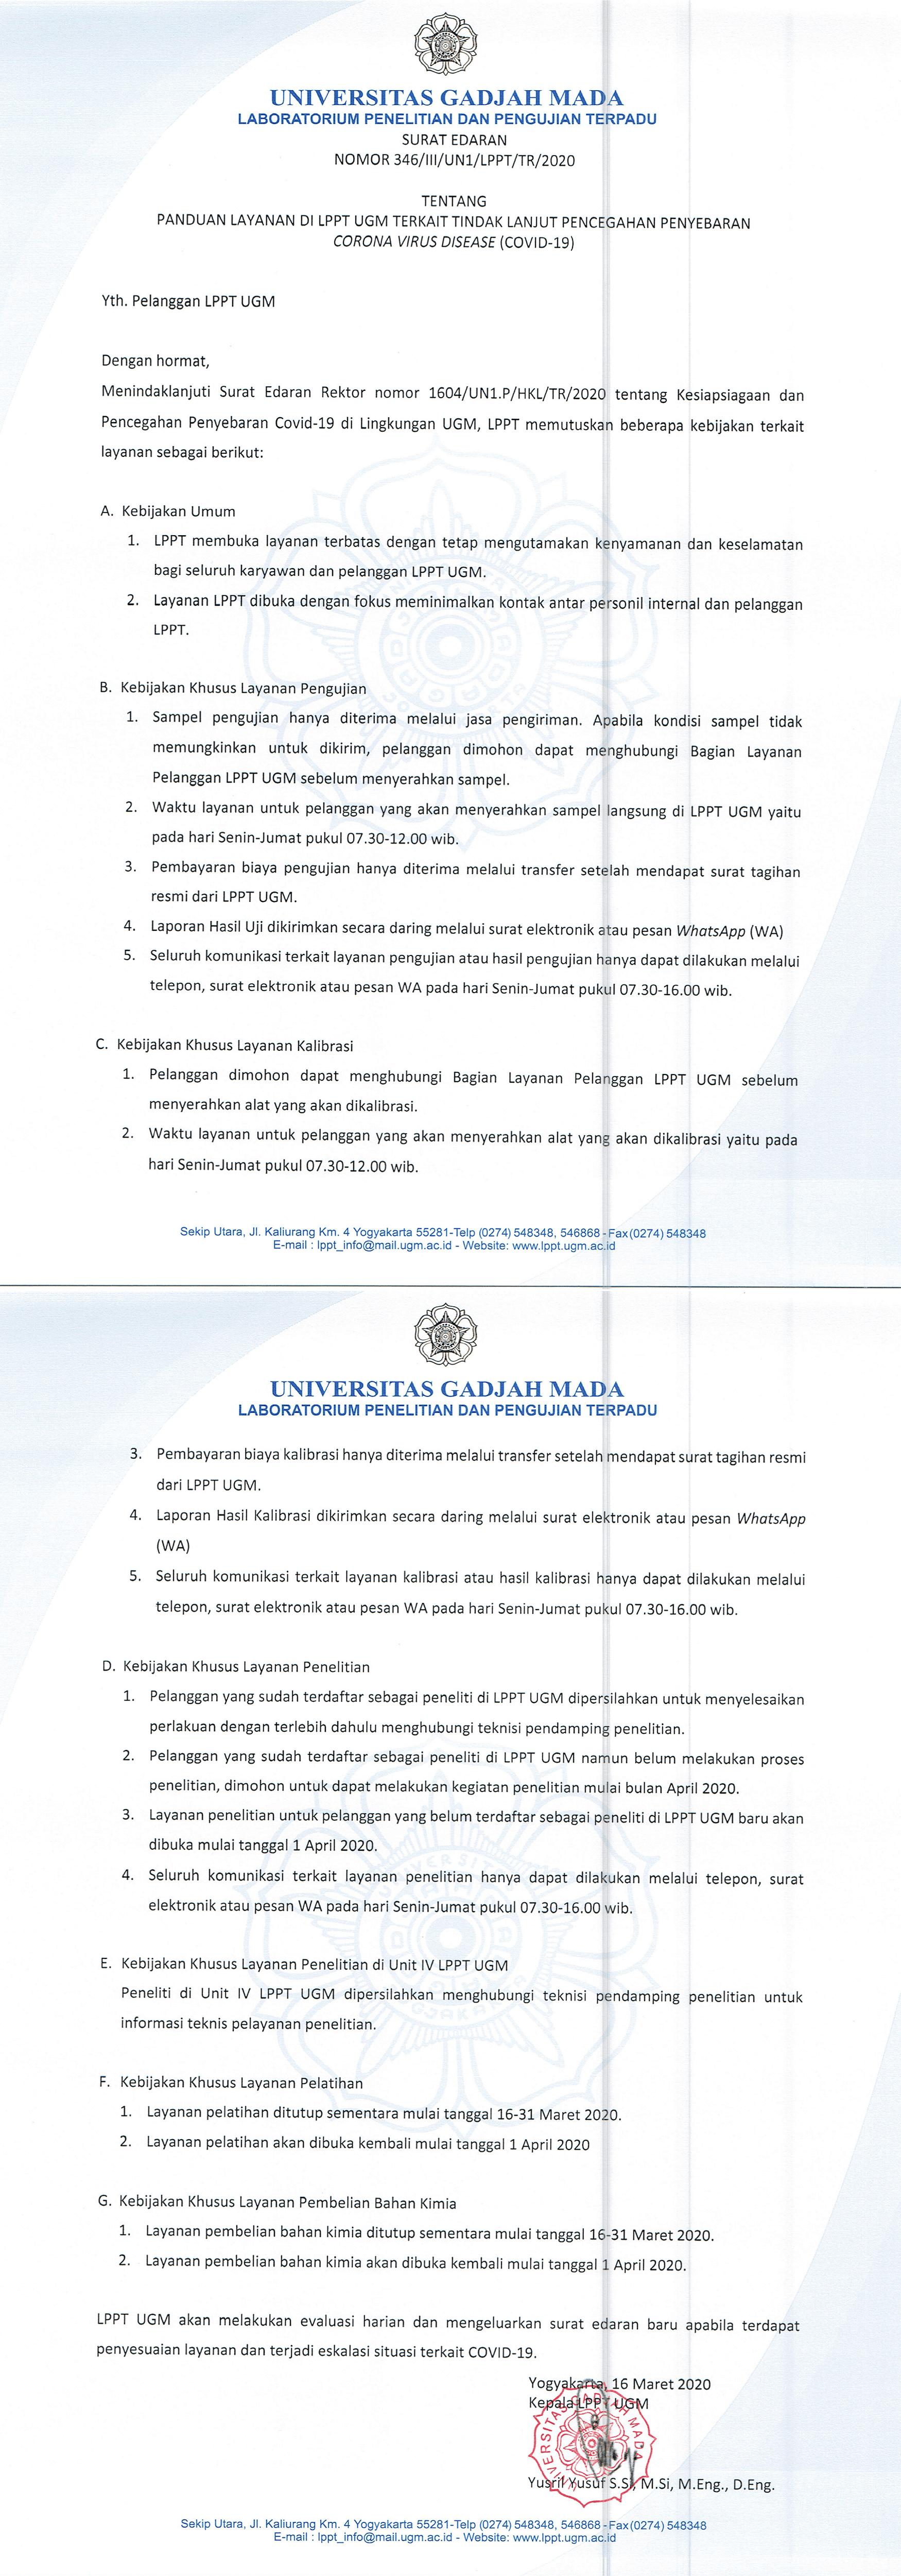 Madi Page 2 Laboratorium Penelitian Dan Pengujian Terpadu